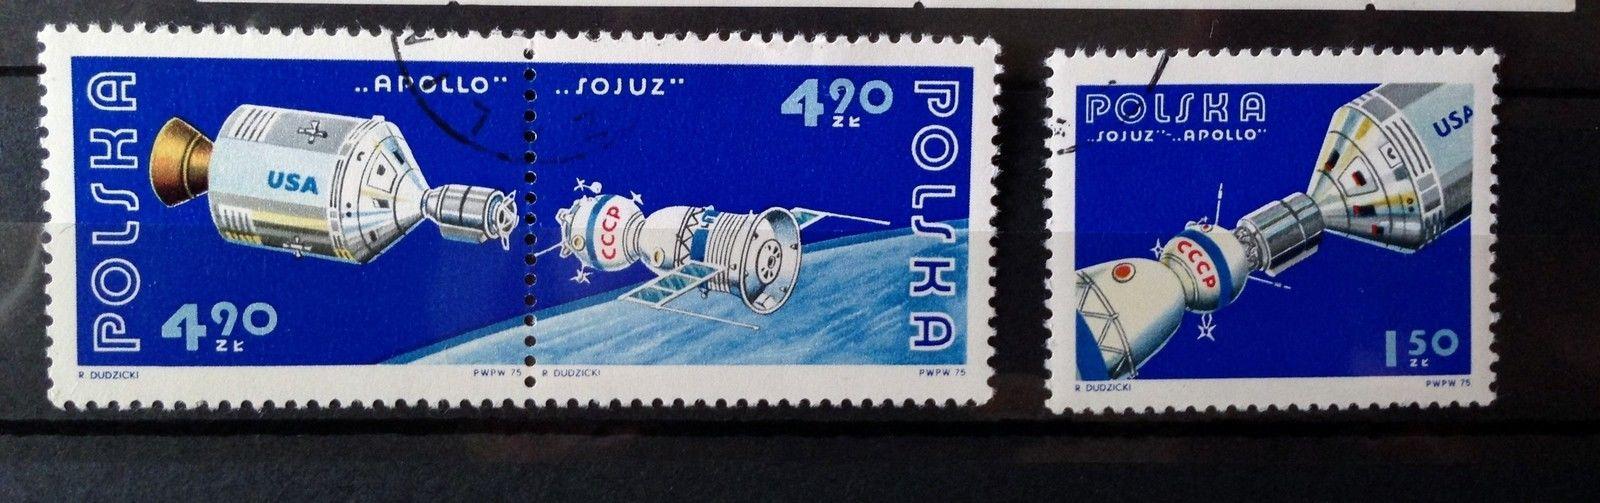 Stamps Poland 1975 Space Apollo Soyuz 1 Souvenir sheet S/S + 3 stamps